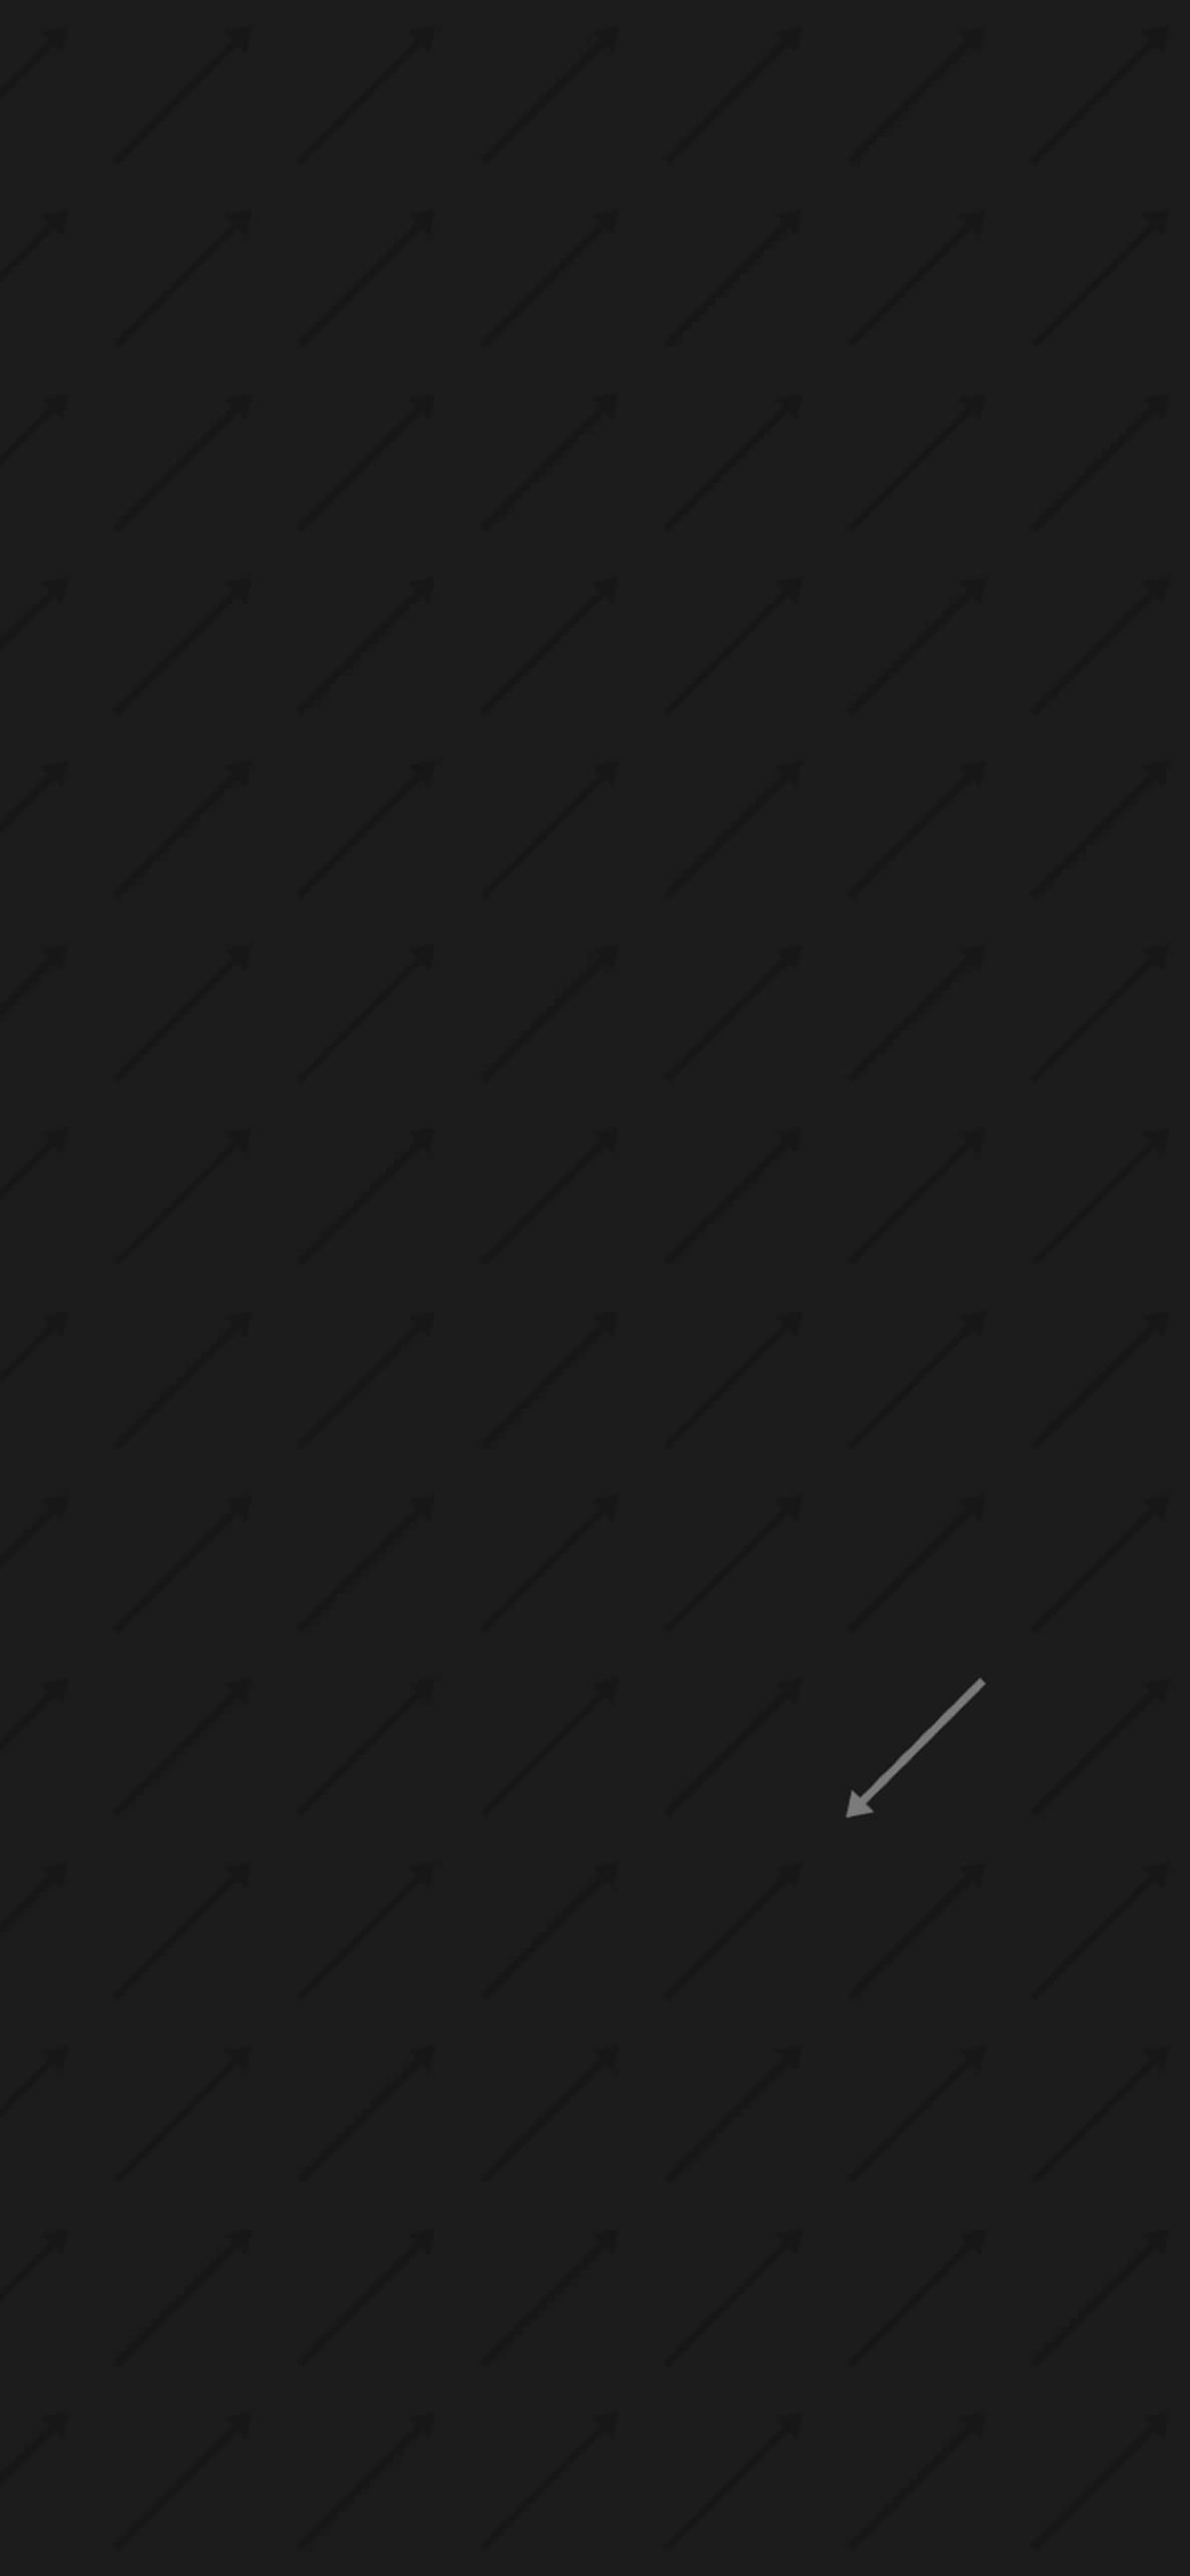 black wallpaper iphone xs max